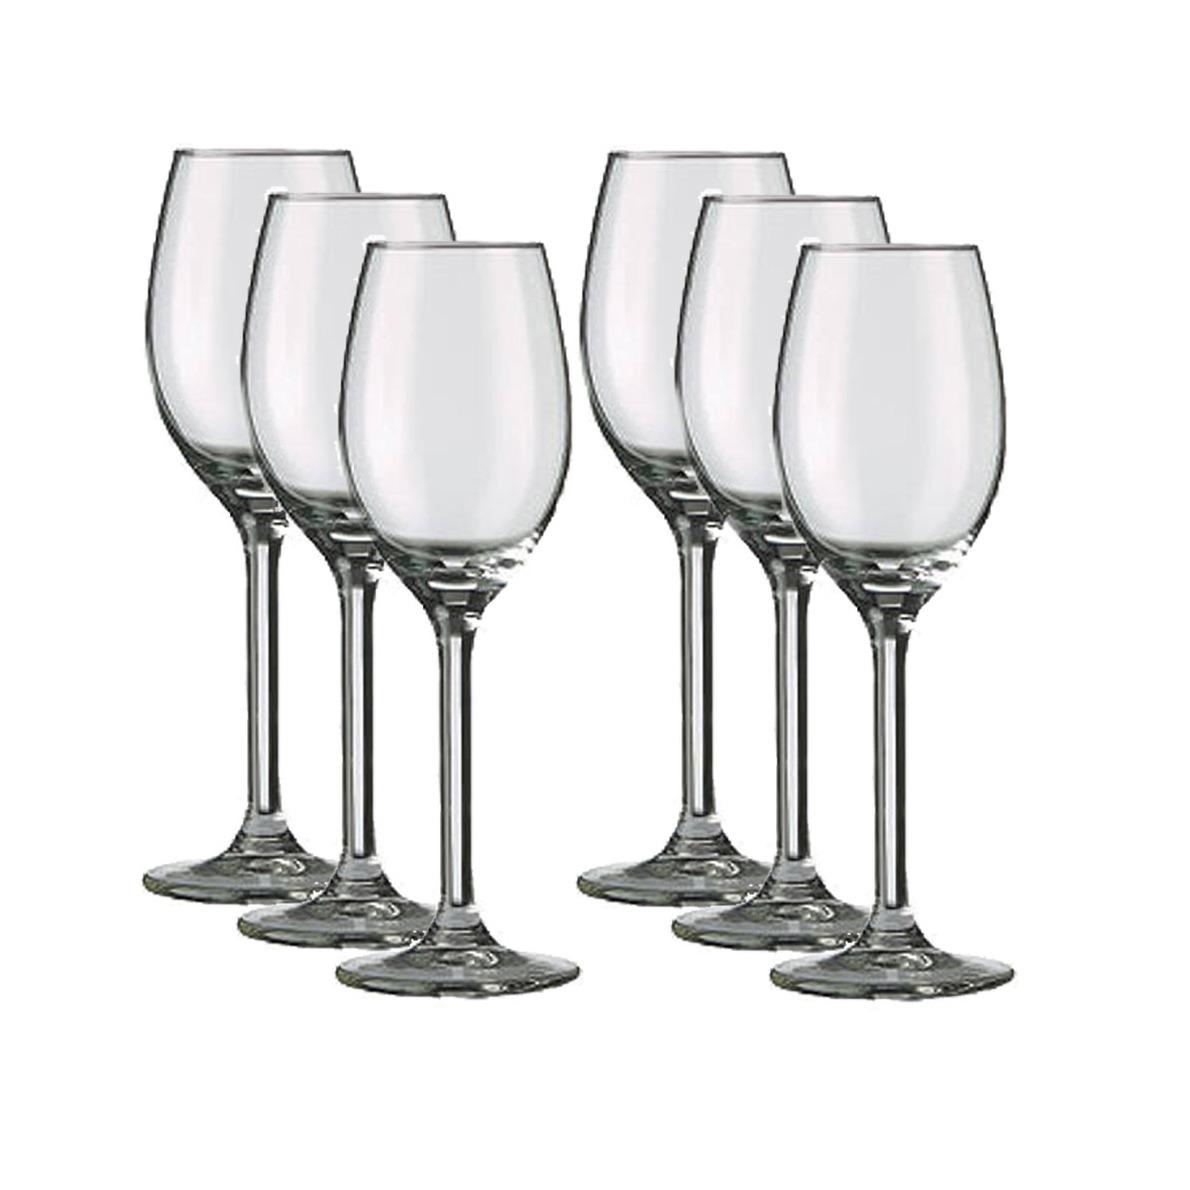 18x Port-sherryglazen transparant 140 ml Esprit